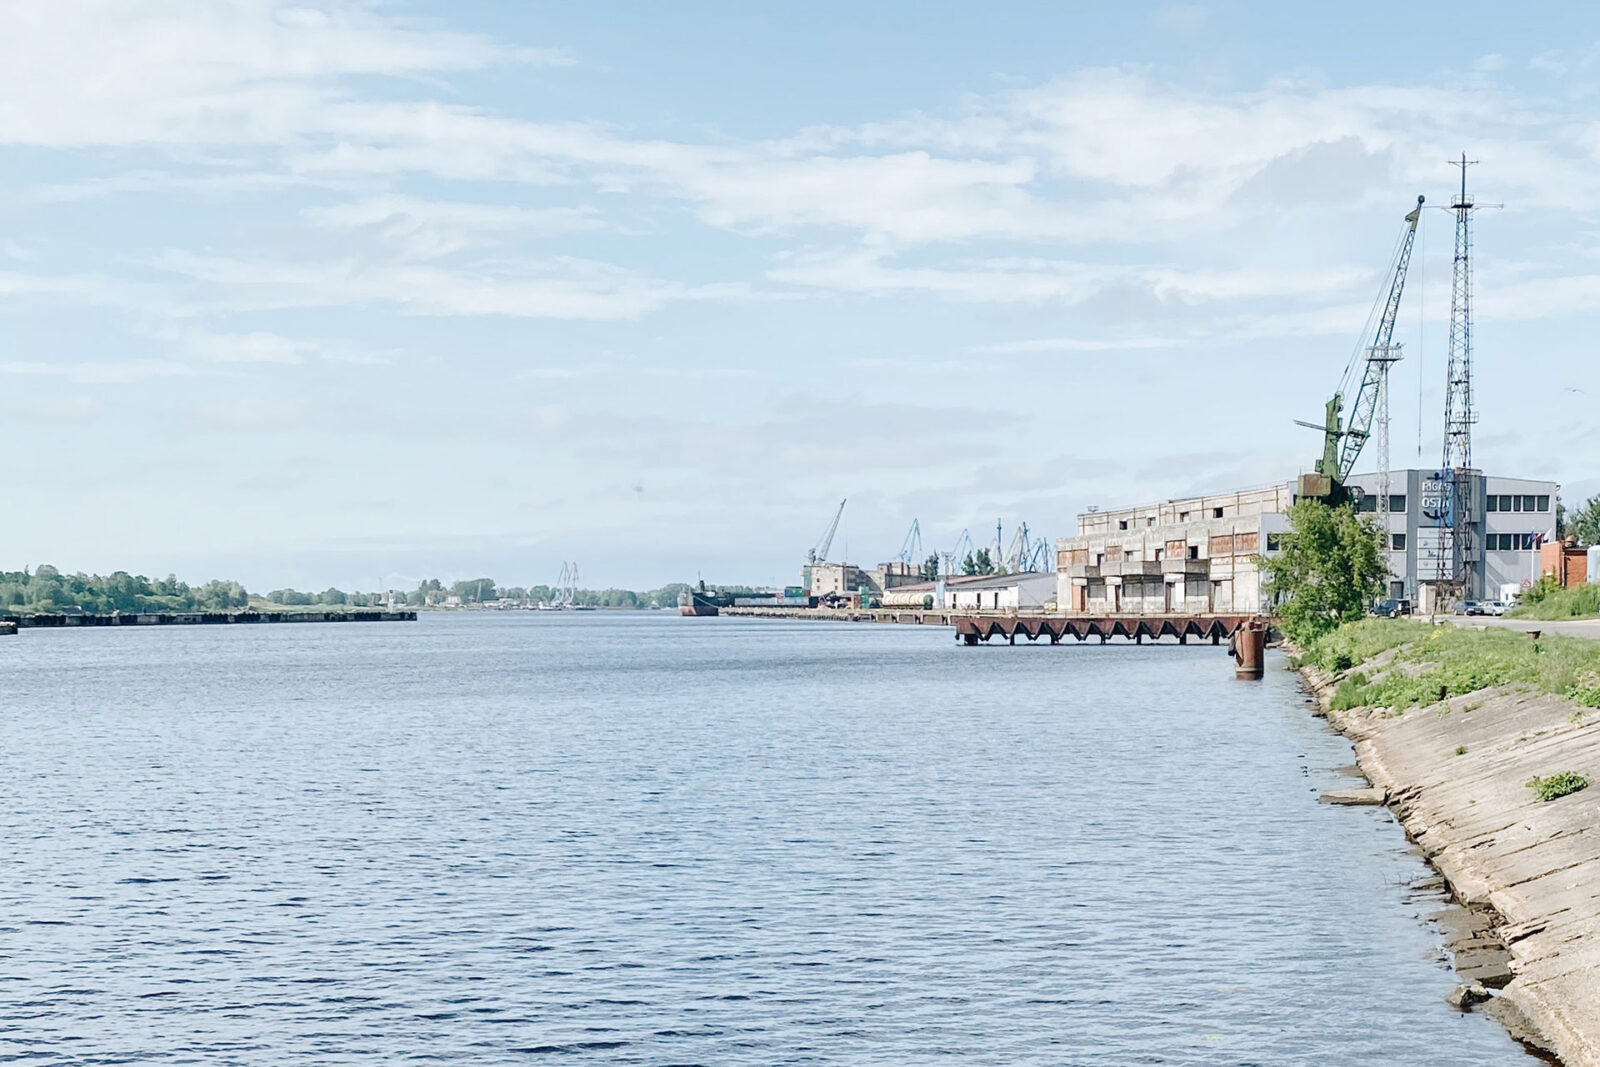 Riga International Biennial of Contemporary Art 2020: Building a New World